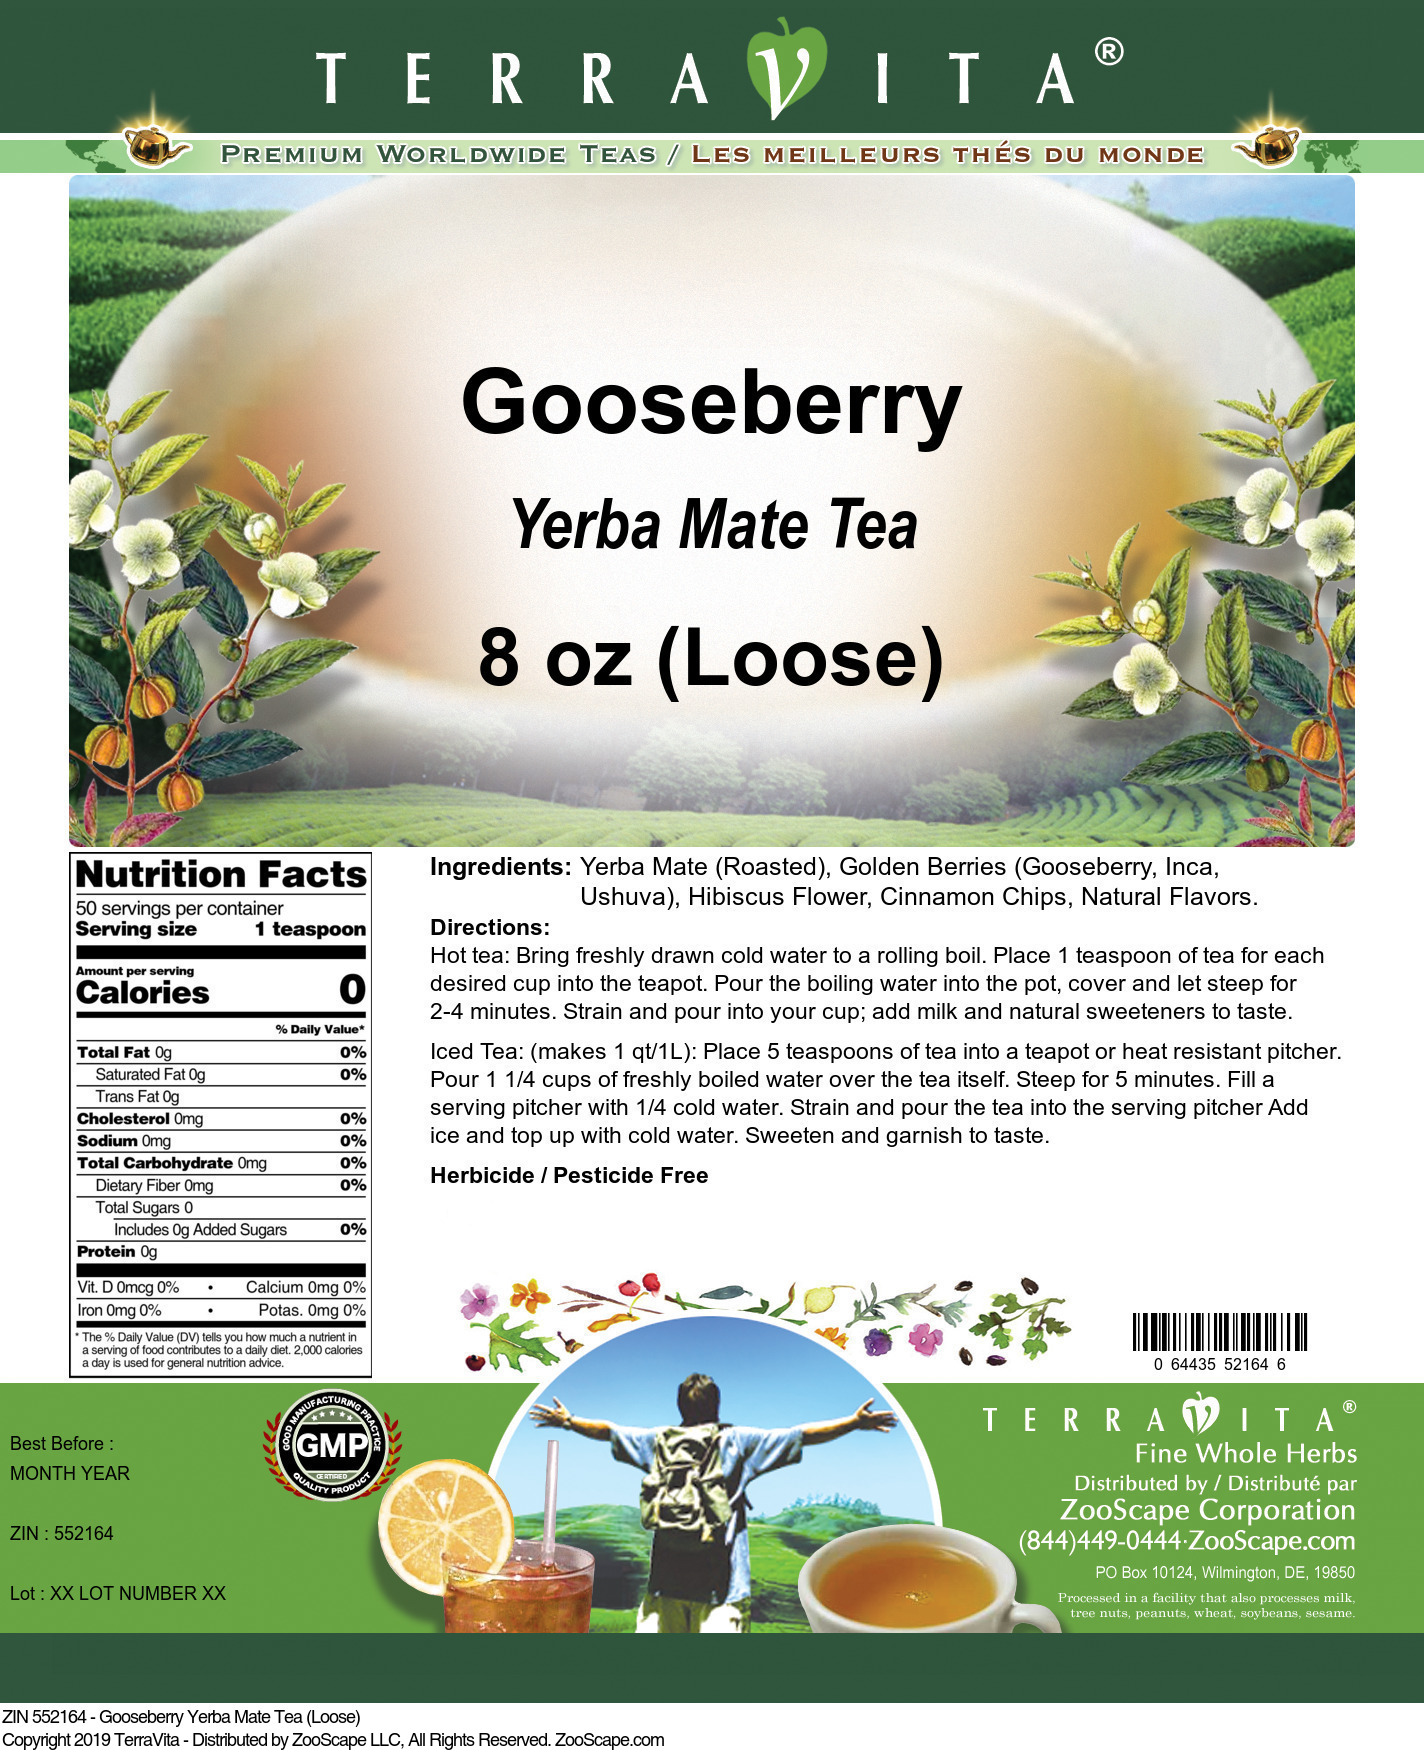 Gooseberry Yerba Mate Tea (Loose)